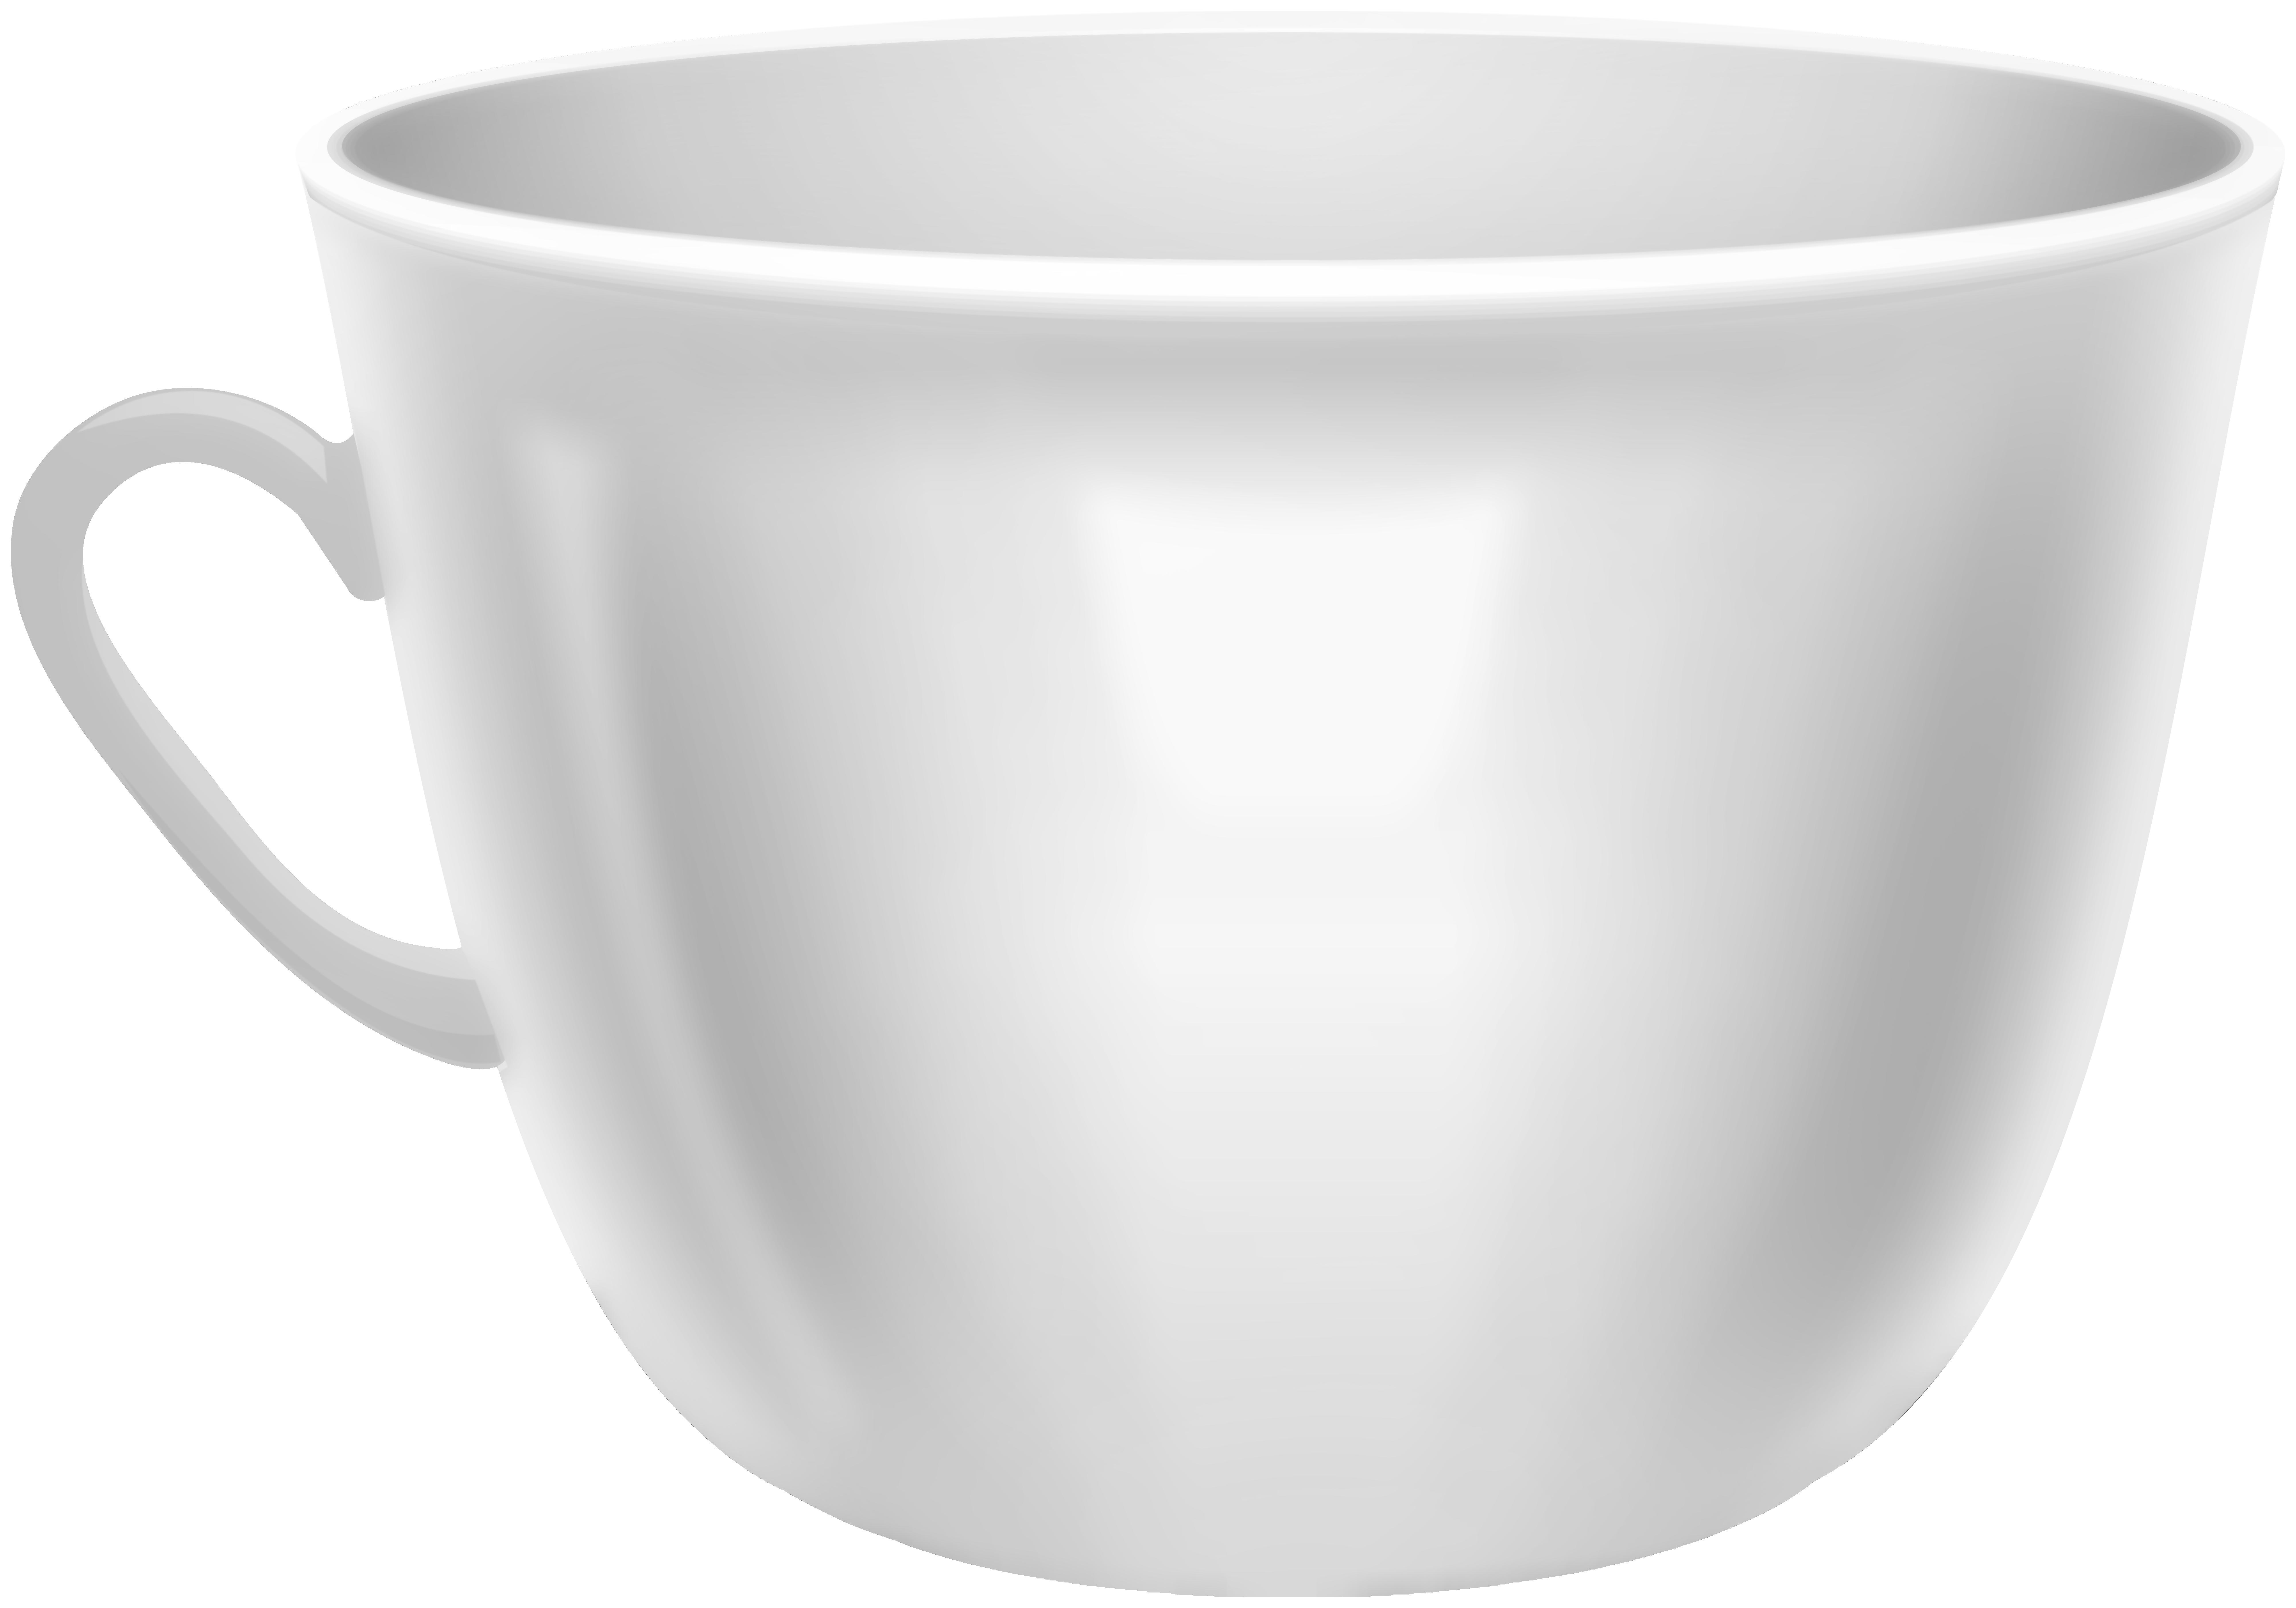 White Coffee Mug PNG Clip Art.